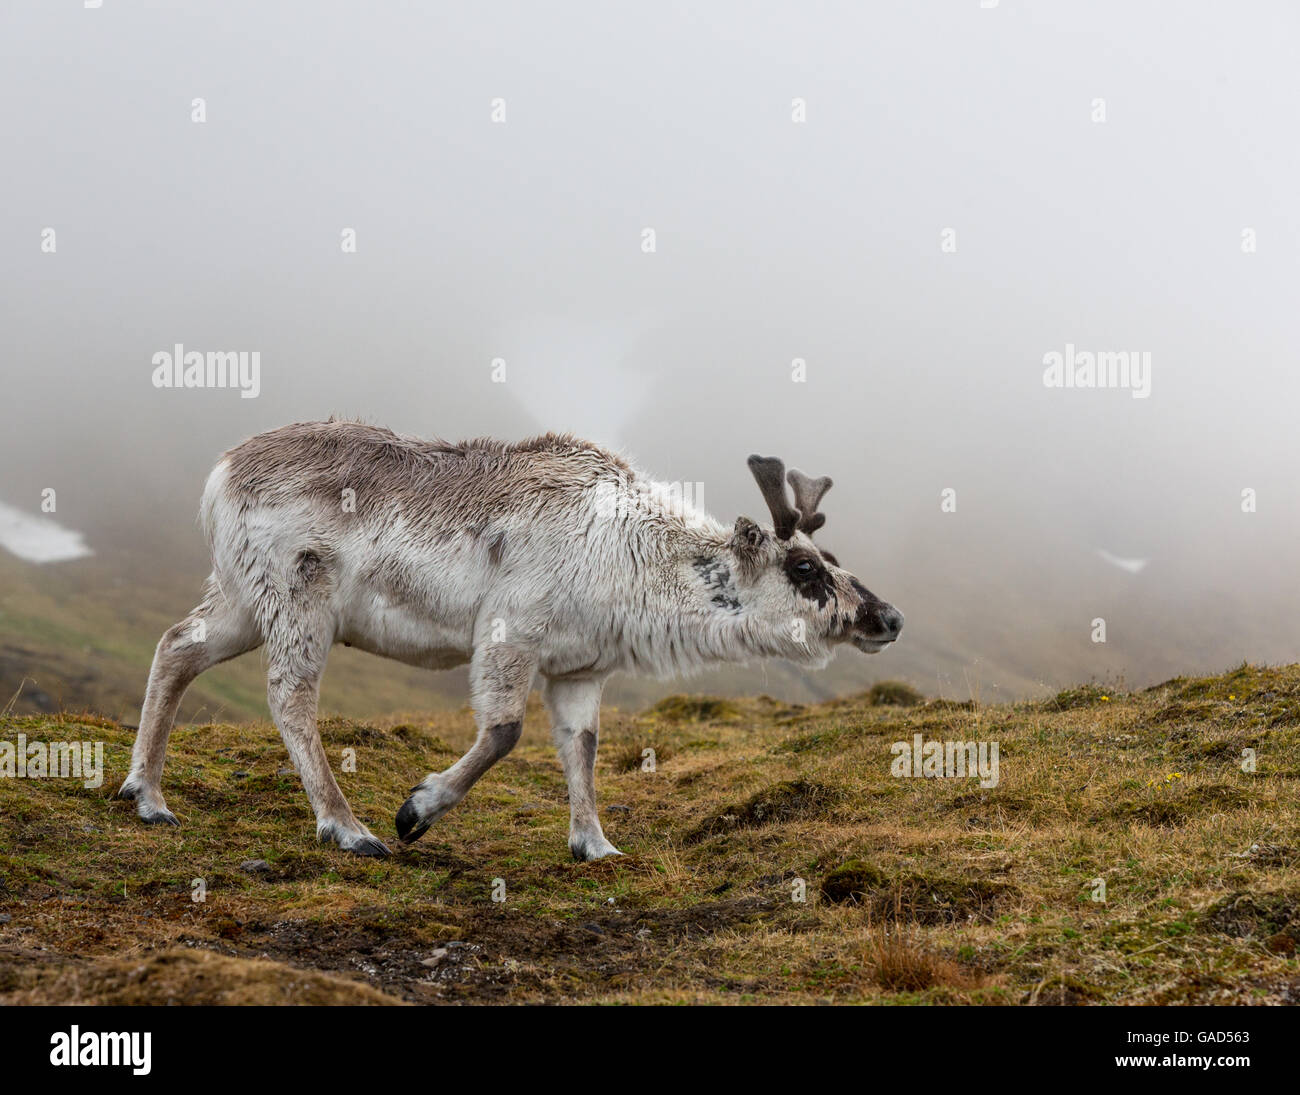 Le renne nella nebbia, Alkhornet, Isfjorden, Spitsbergen, Svalbard, Norvegia Immagini Stock